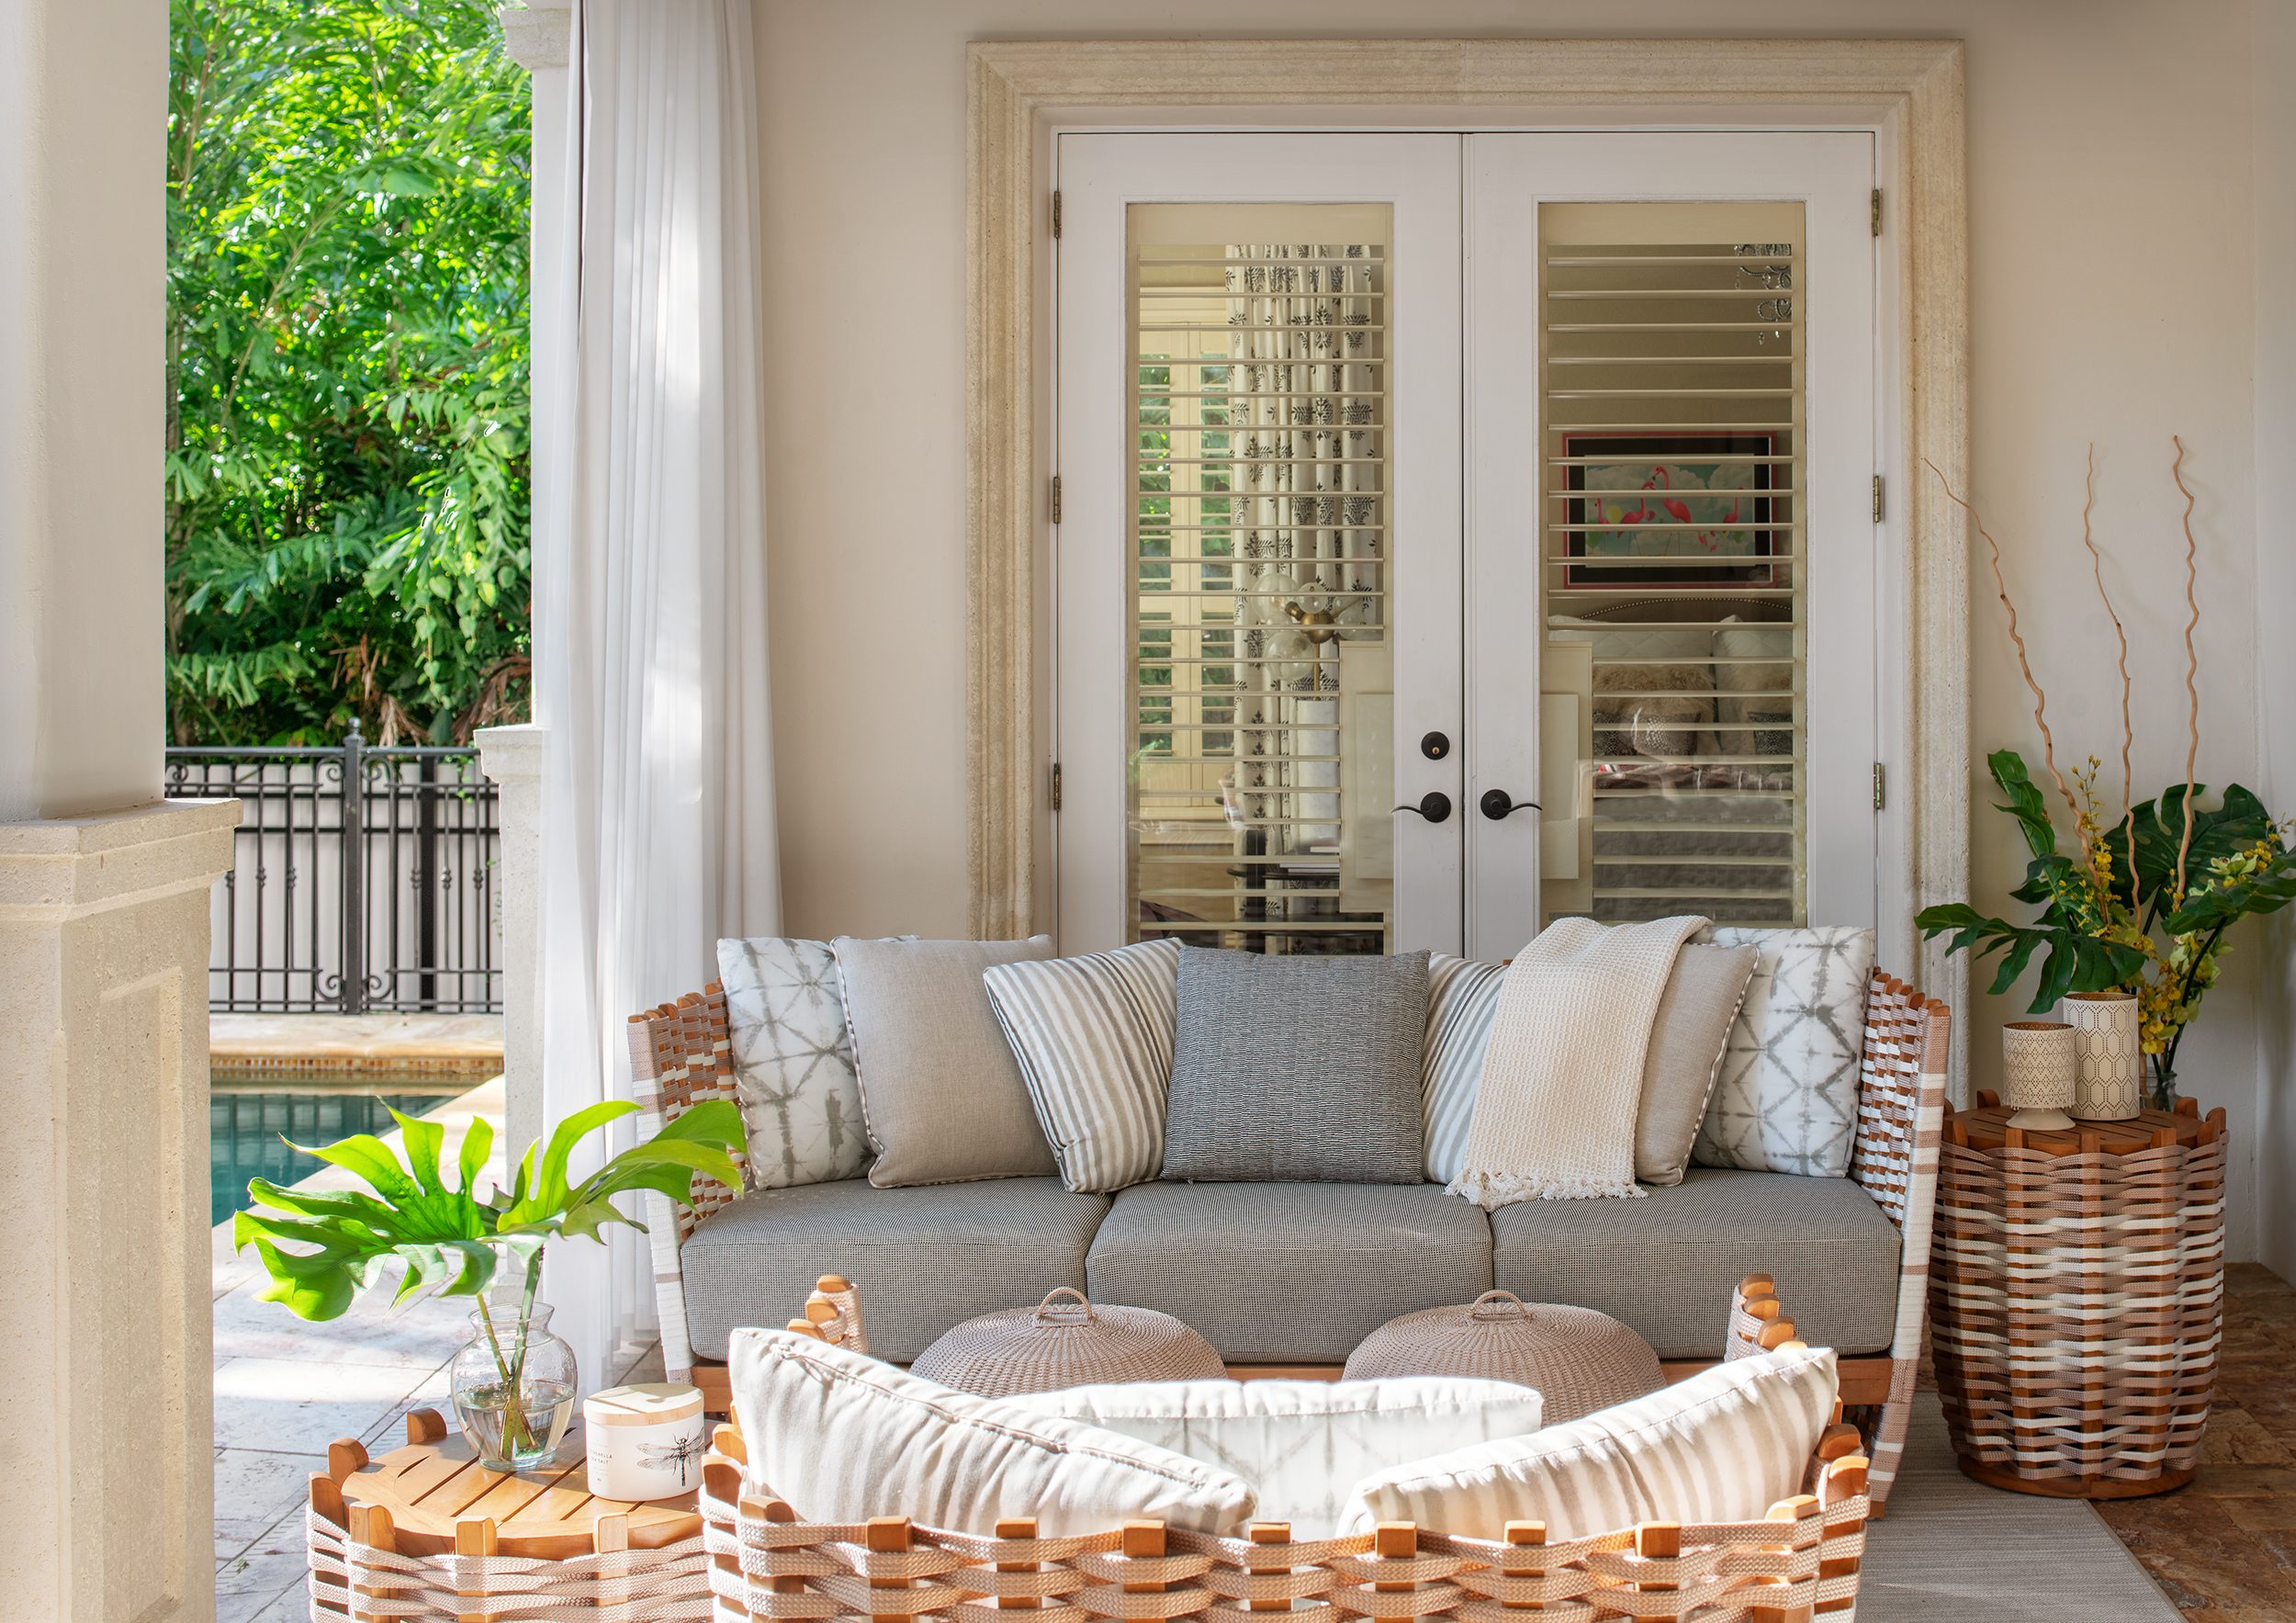 kylie-ponton---martinique---back-patio-seating-one.jpeg